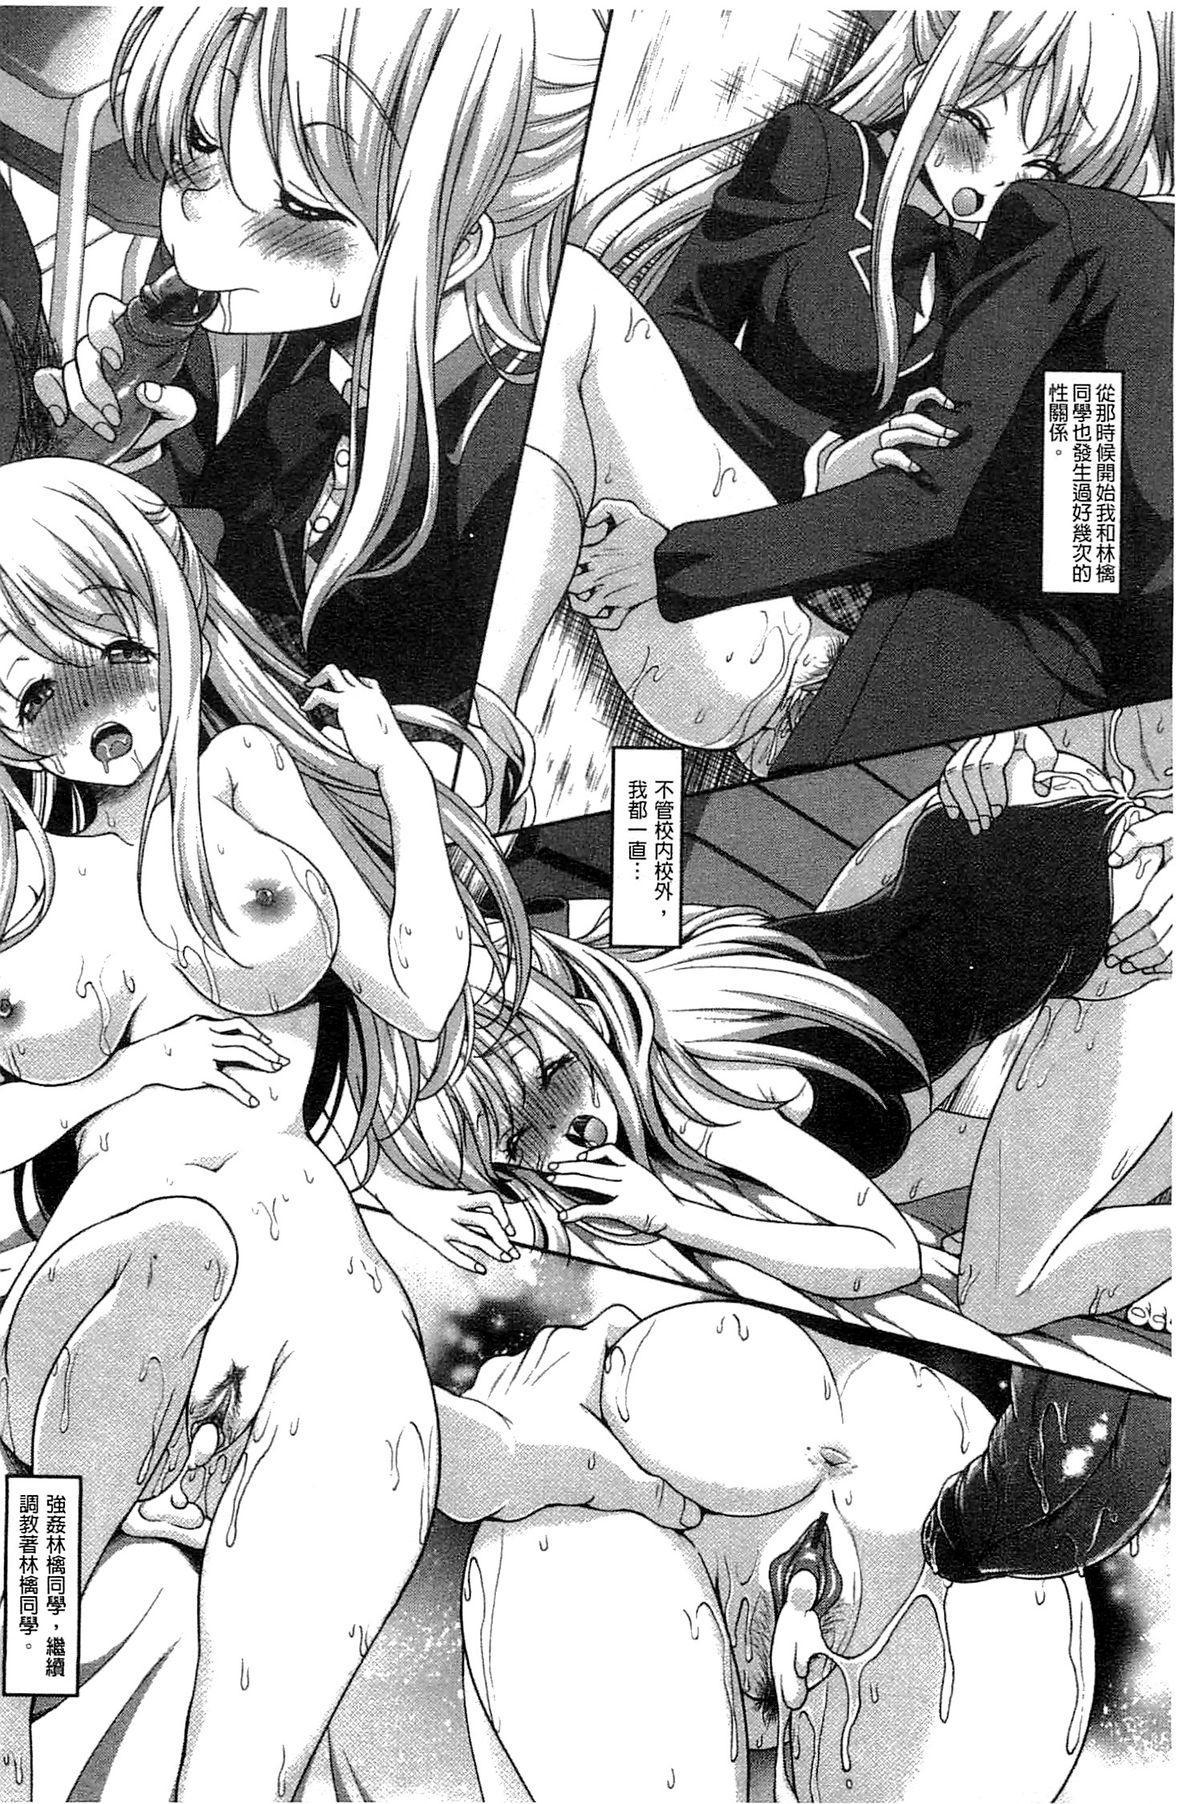 Hajimete nan dakara - First sexual experience 32